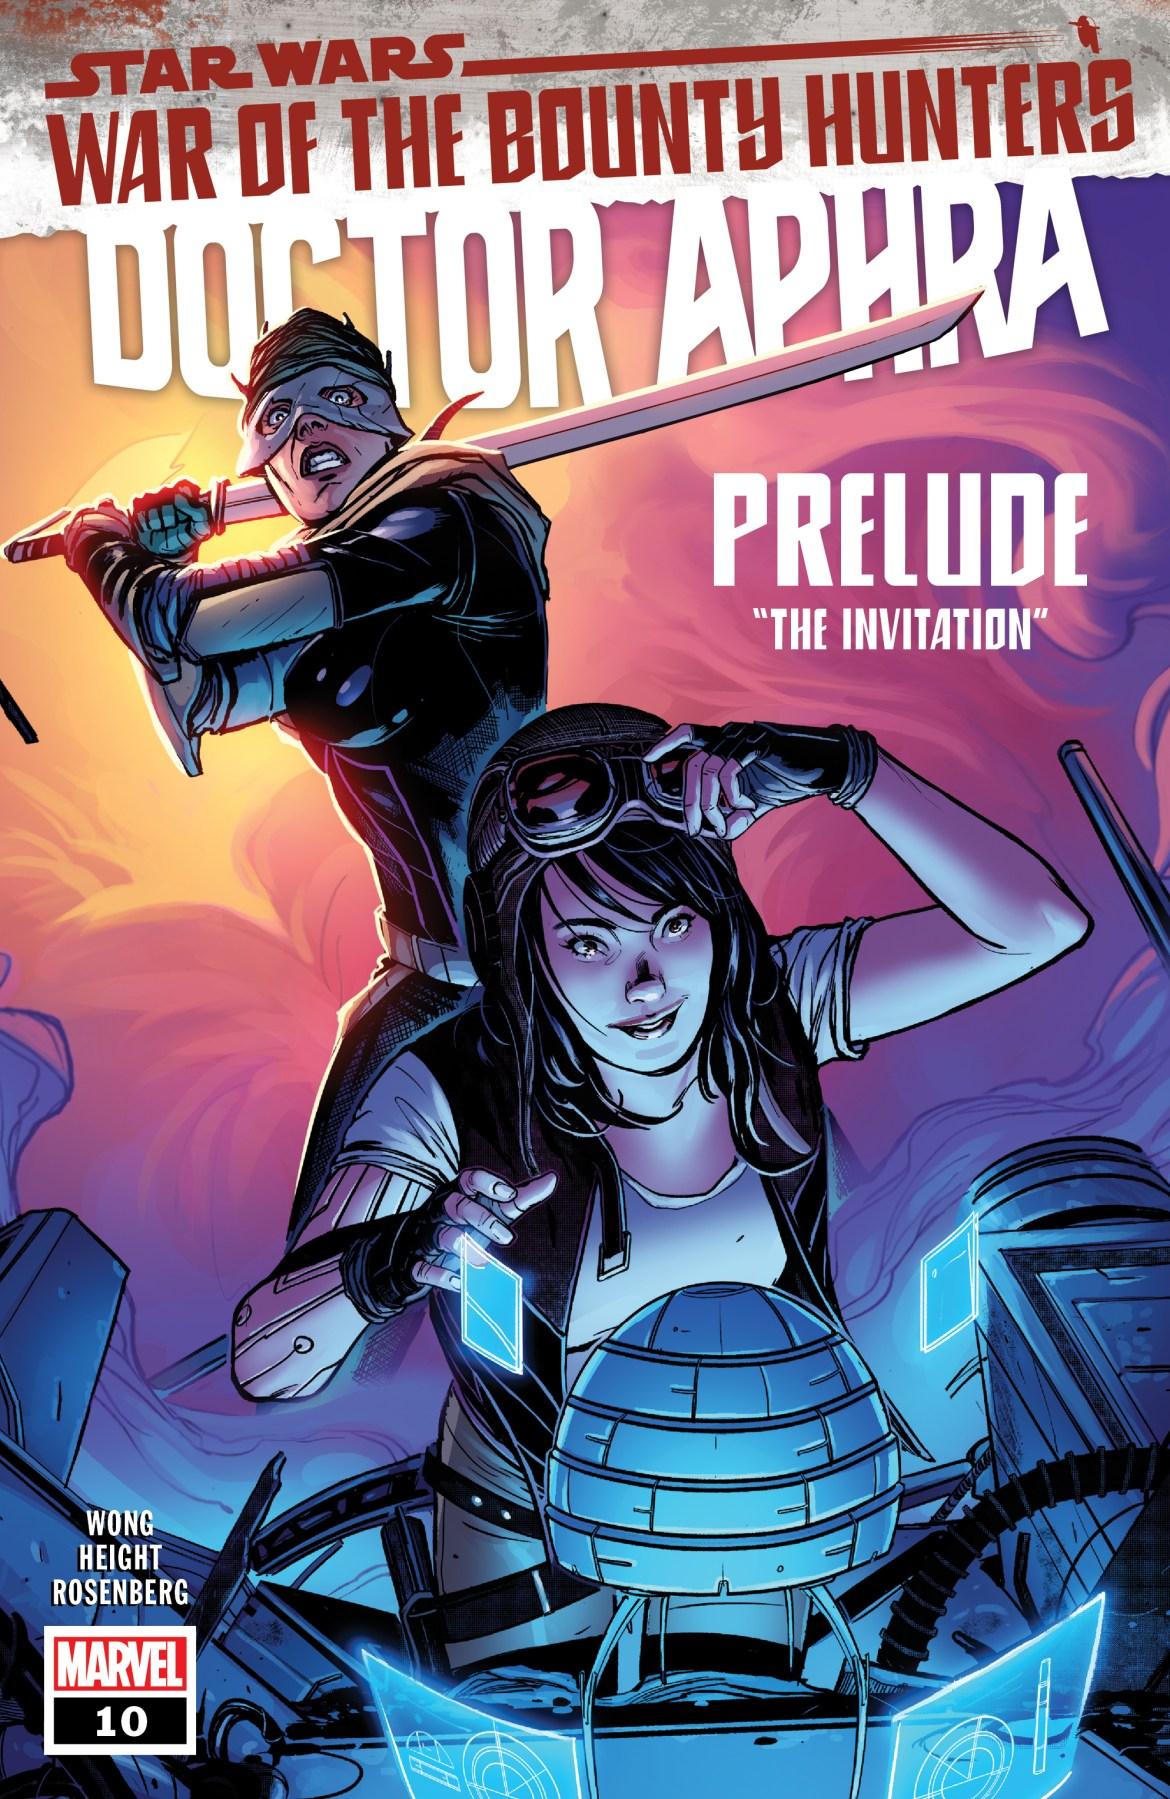 2021_STW-WOTBH_Aphra_10-1 Marvel Comics May 2021 Solicitations